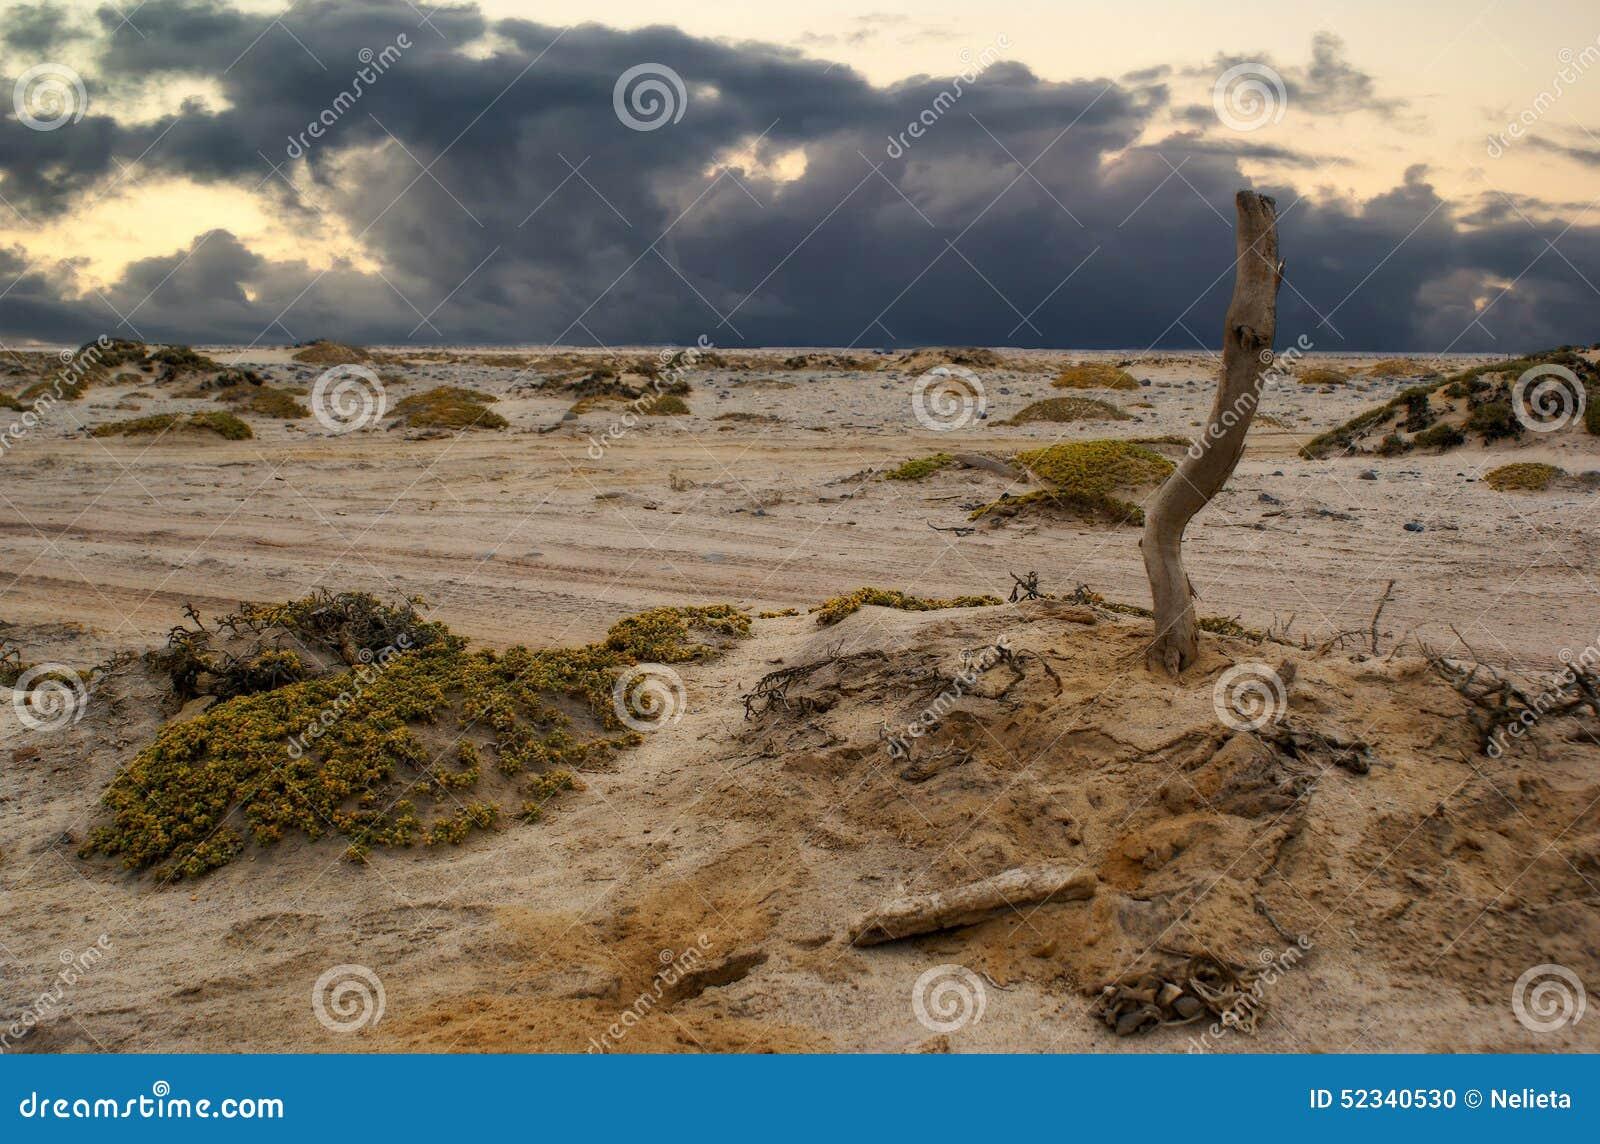 Desertera namib